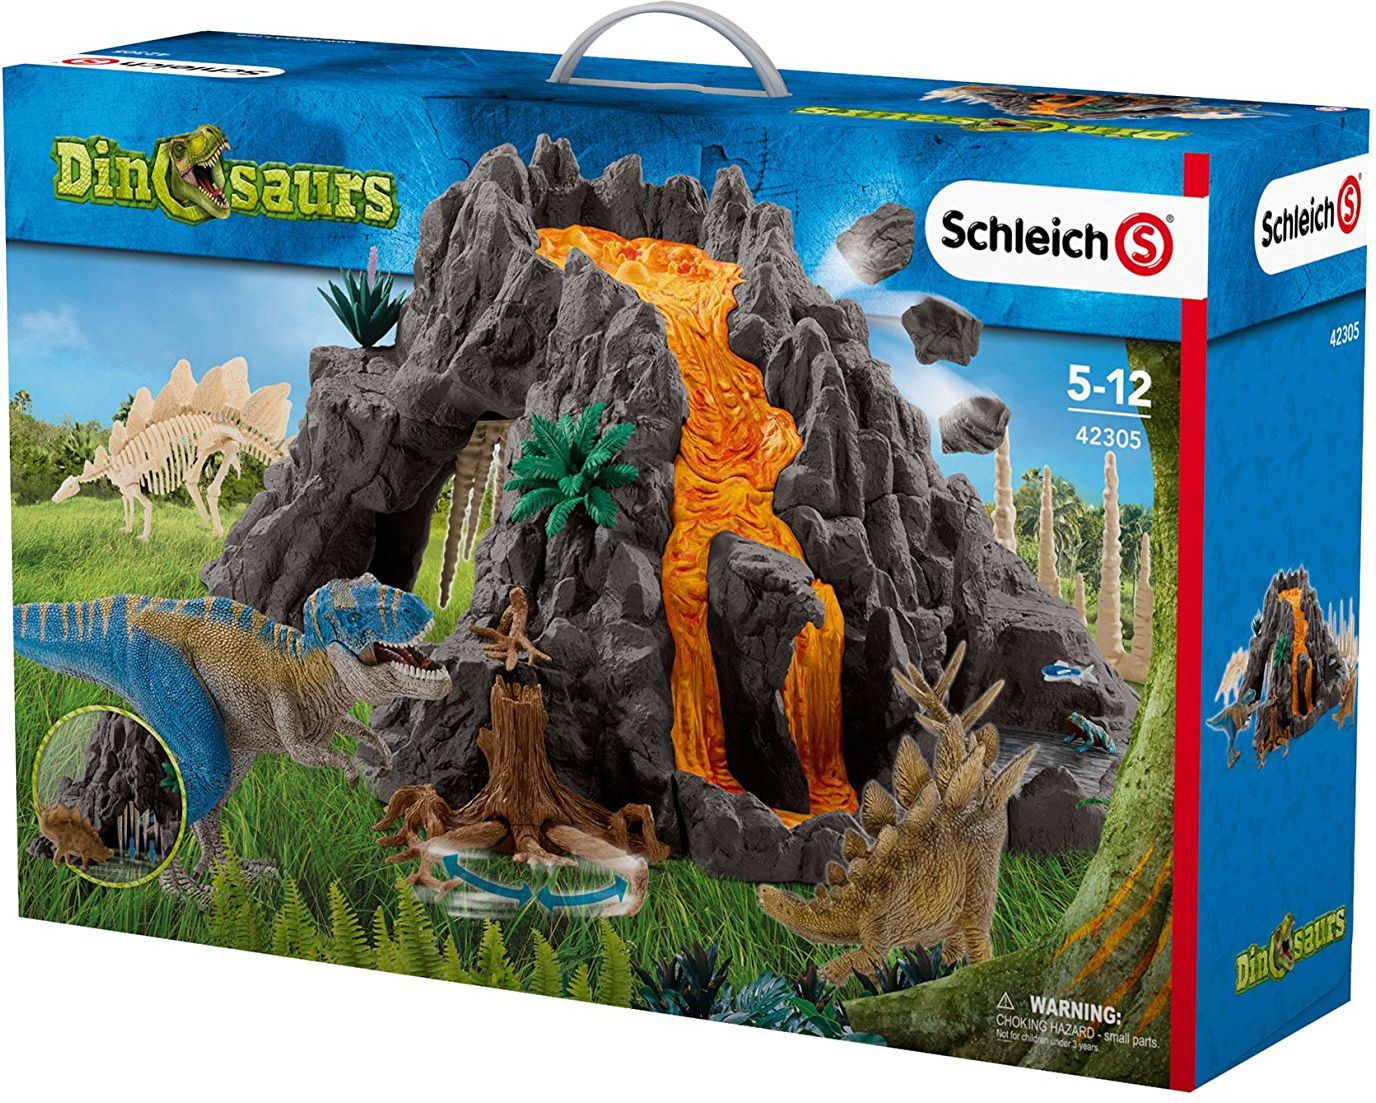 Schleich Dinosaurs - Playsets - Giant Volcano with T-Rex (42305) bērnu rotaļlieta